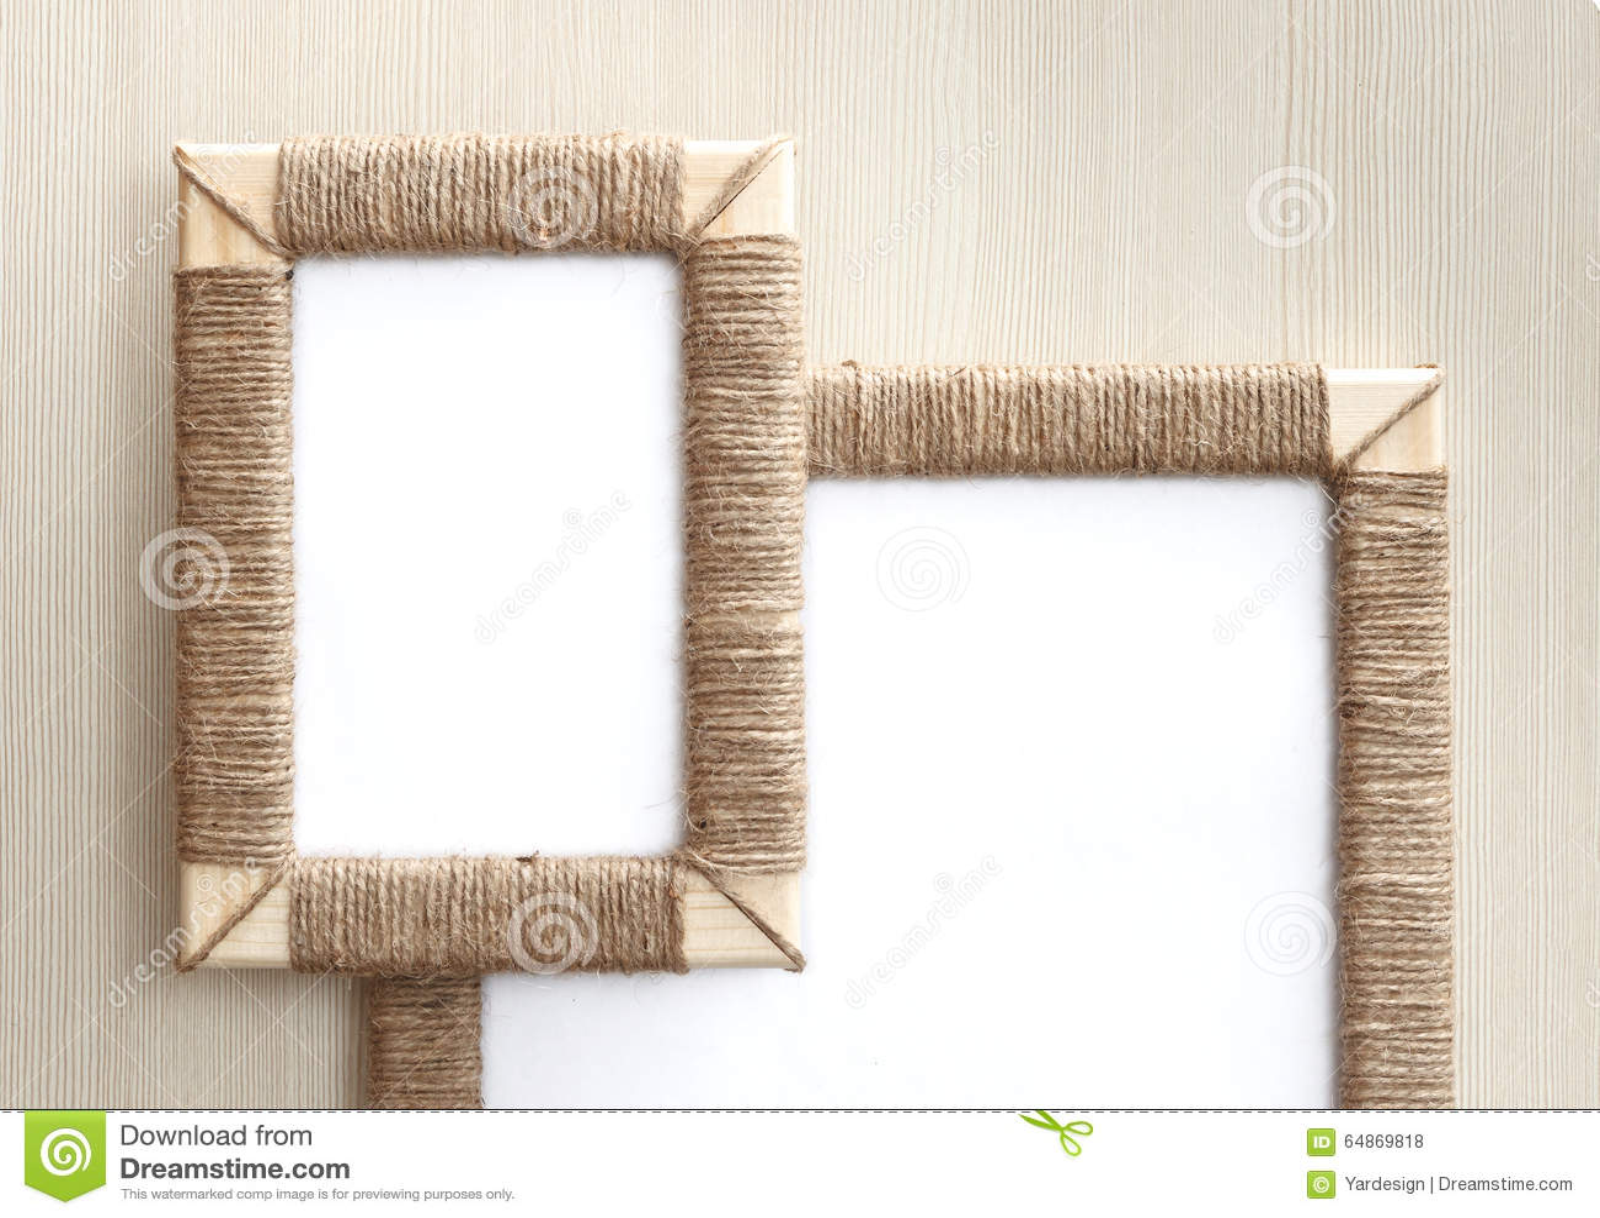 Two handmade photo frames braided jute against wooden background two handmade photo frames braided jute against wooden background jeuxipadfo Images